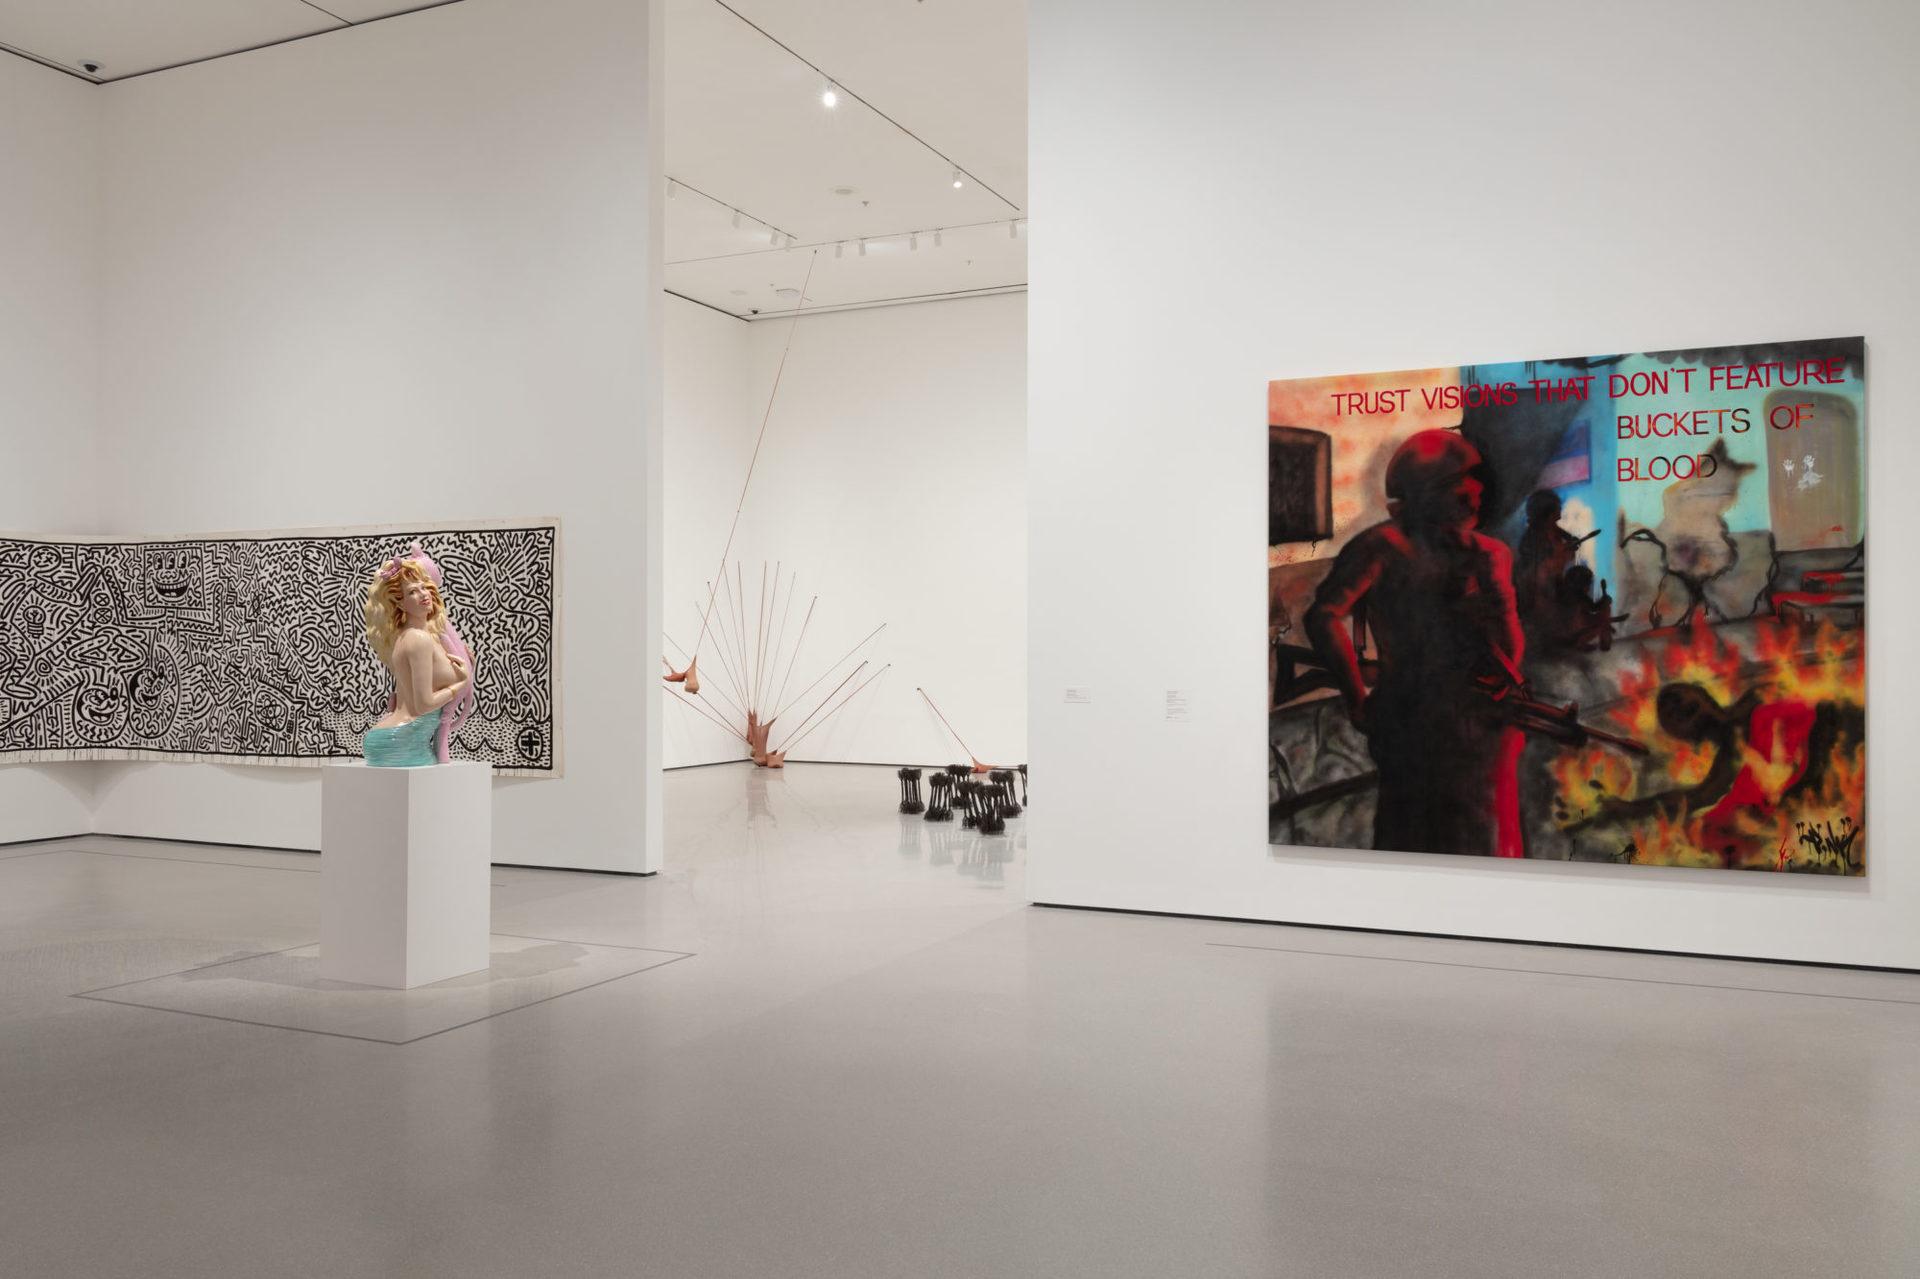 MoMA_Gallery202_John-Wronn-2000x1333.jpg